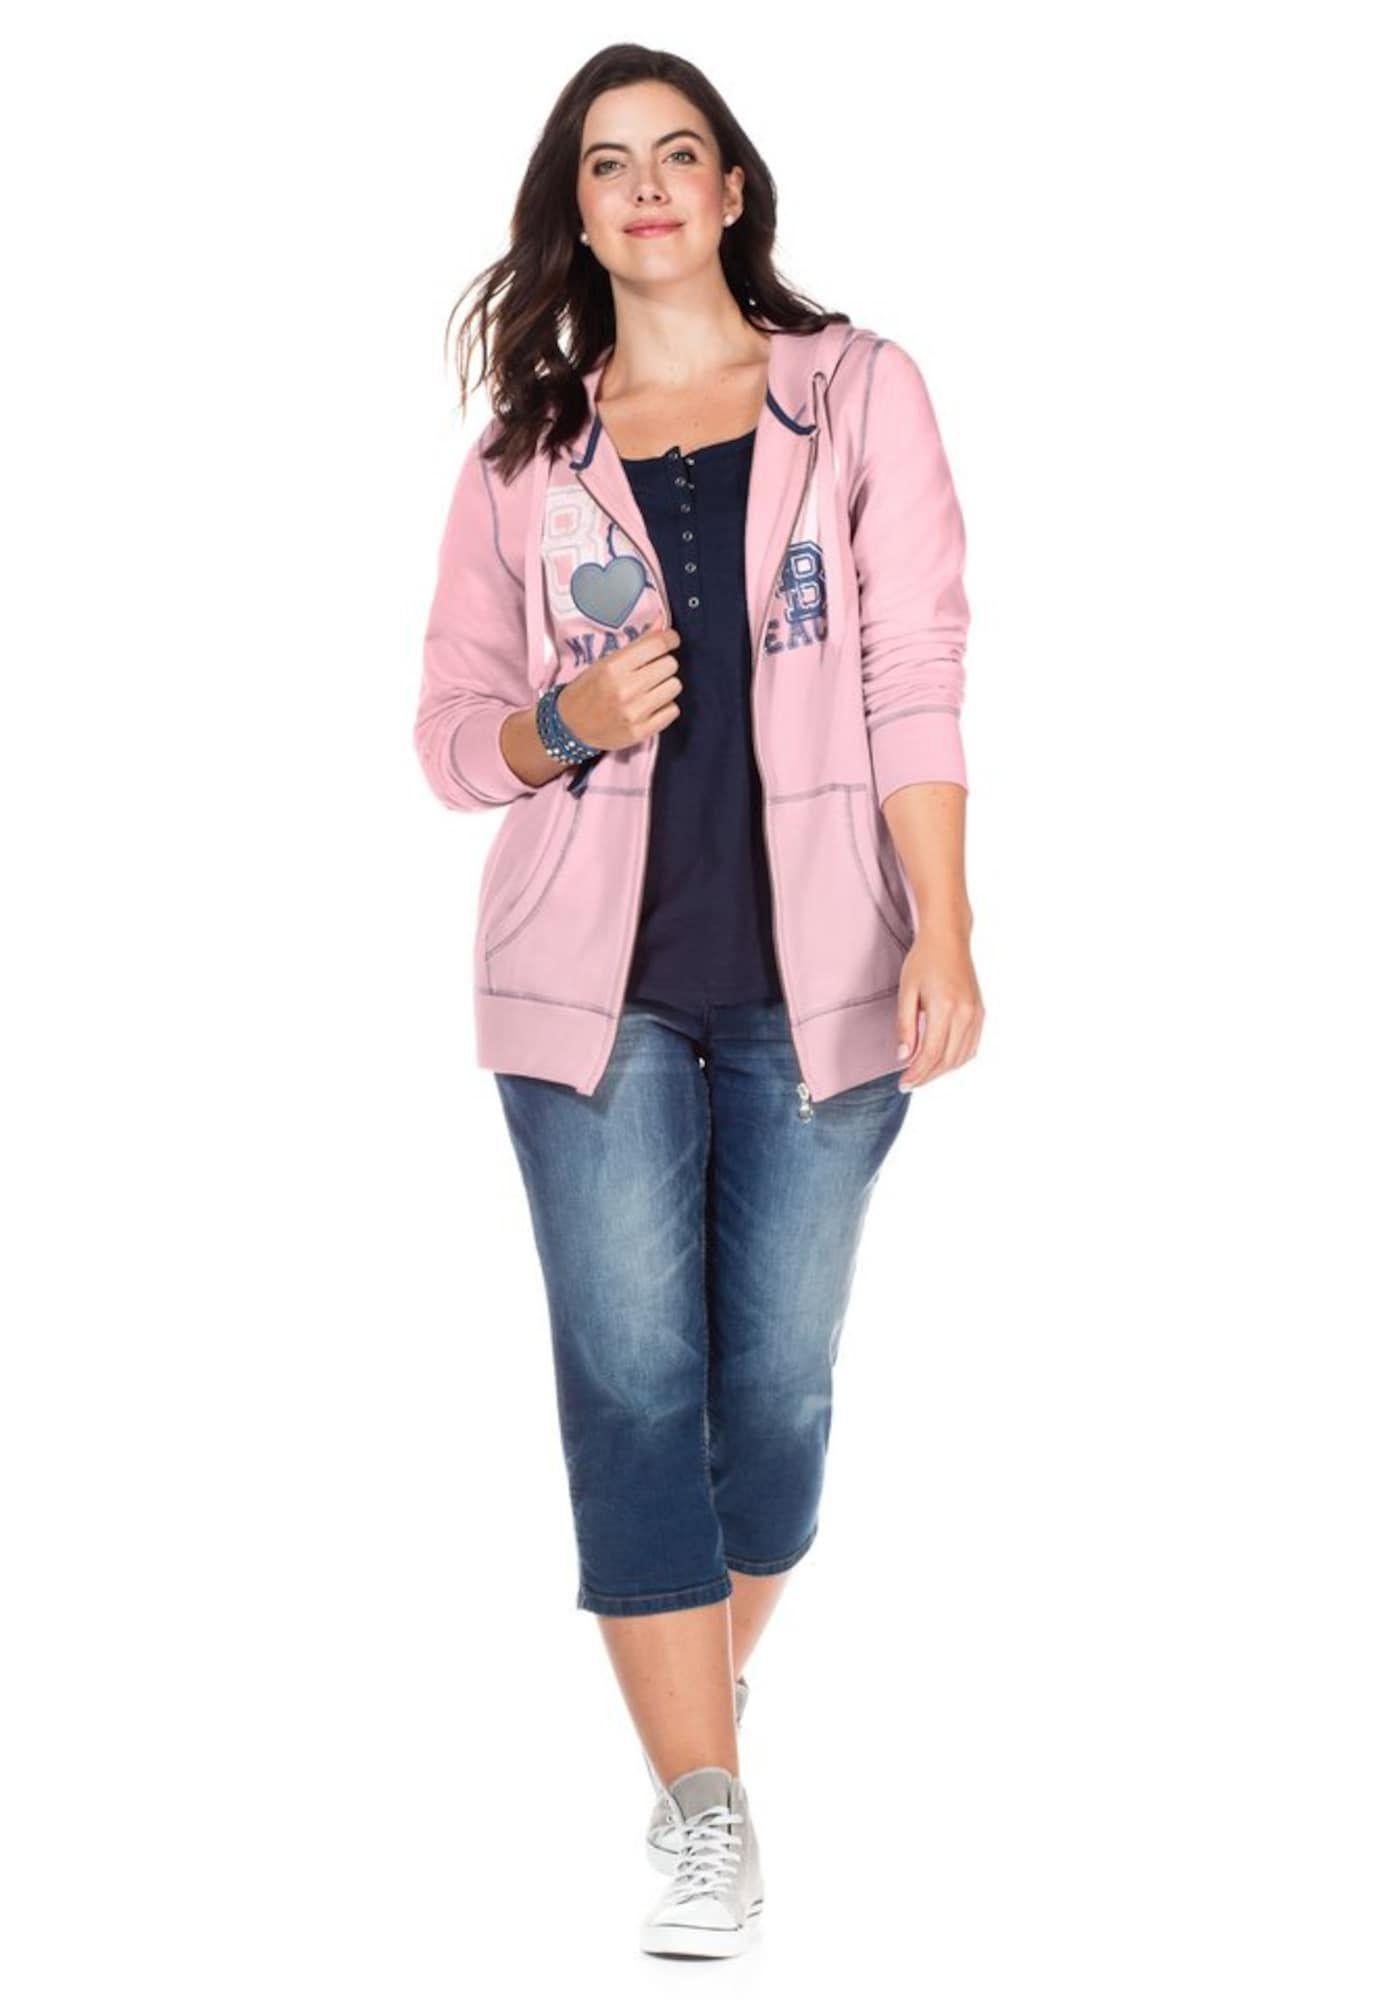 Sheego Sweatjacke Damen Blau Altrosa Weiss Grosse Xxl Xxxl Mit Bildern Sweatjacke Damen Sweatjacke 80er Outfit